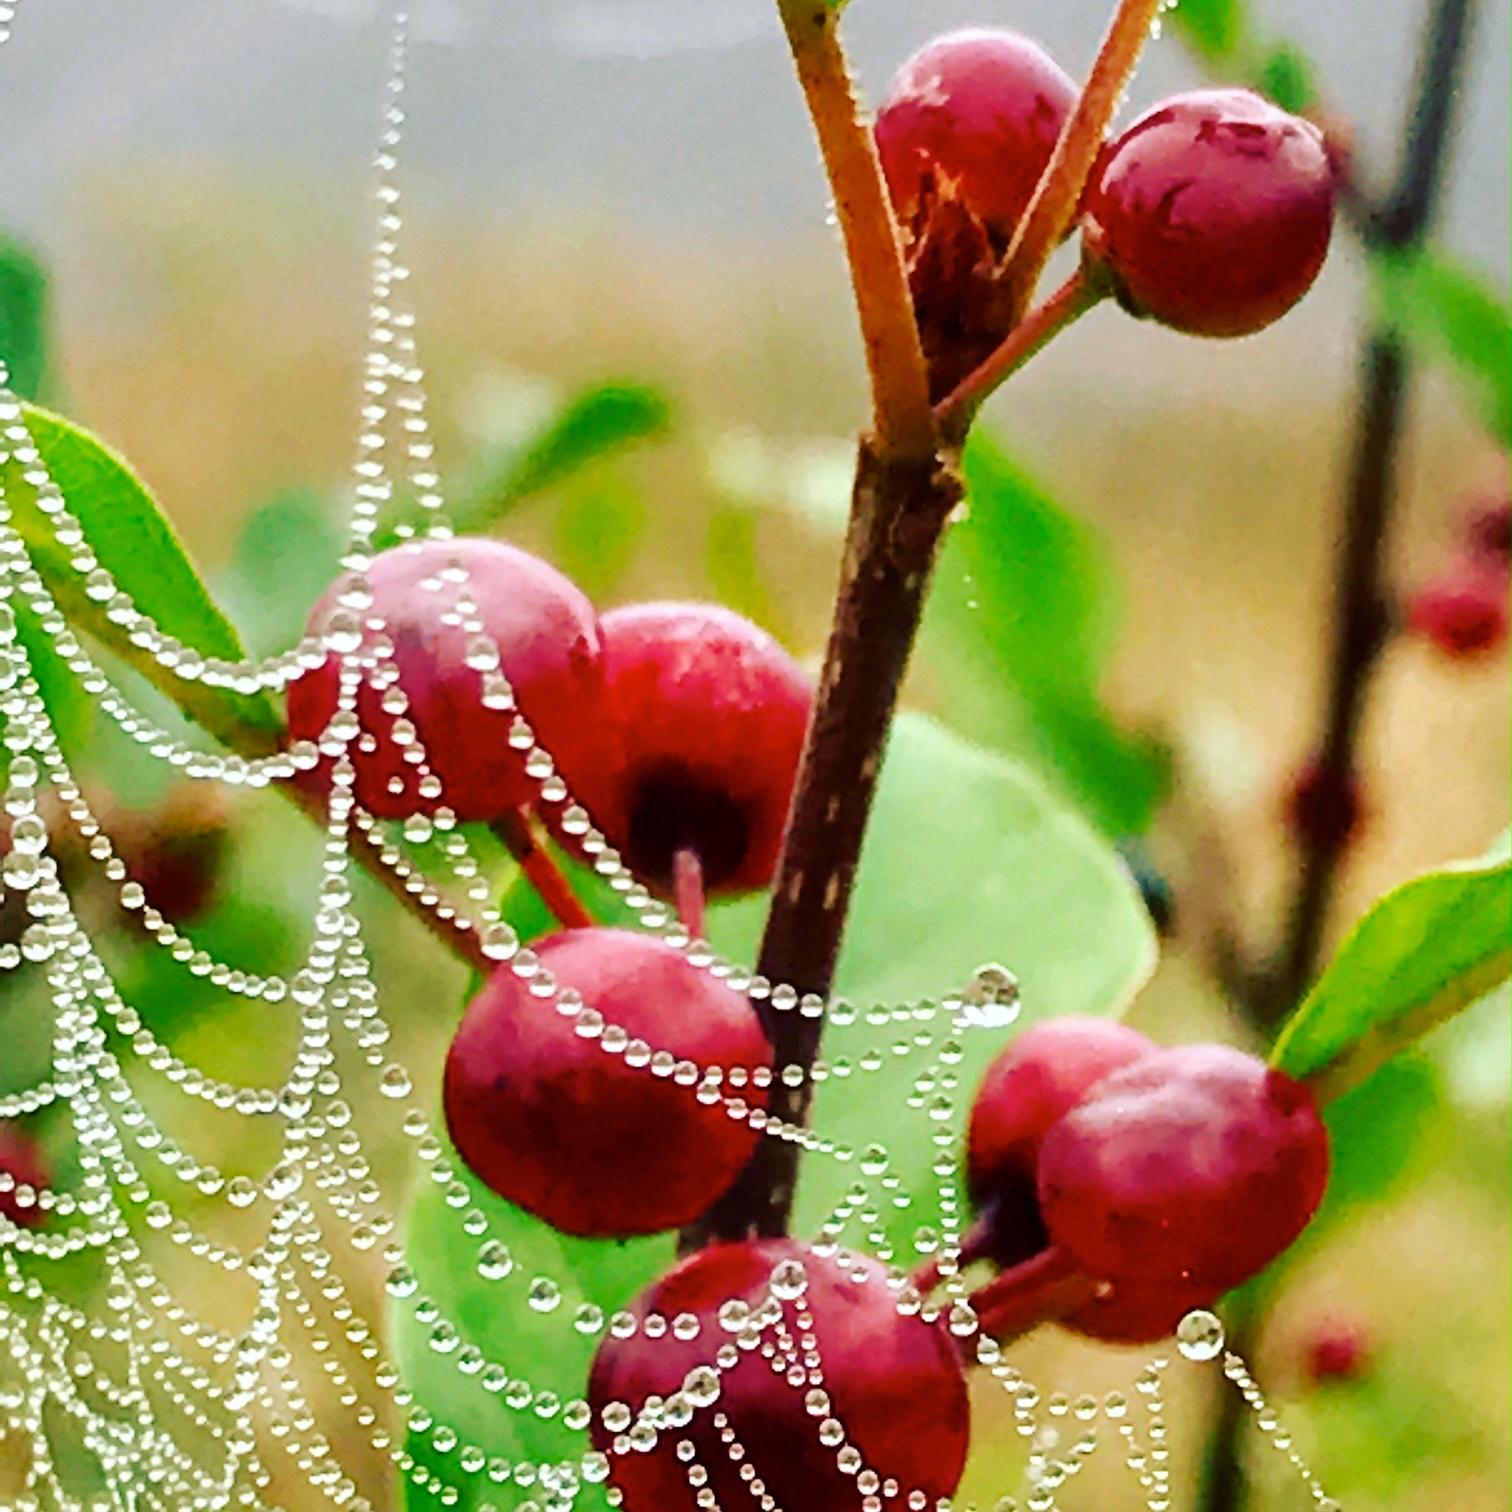 Berries in Morning Web